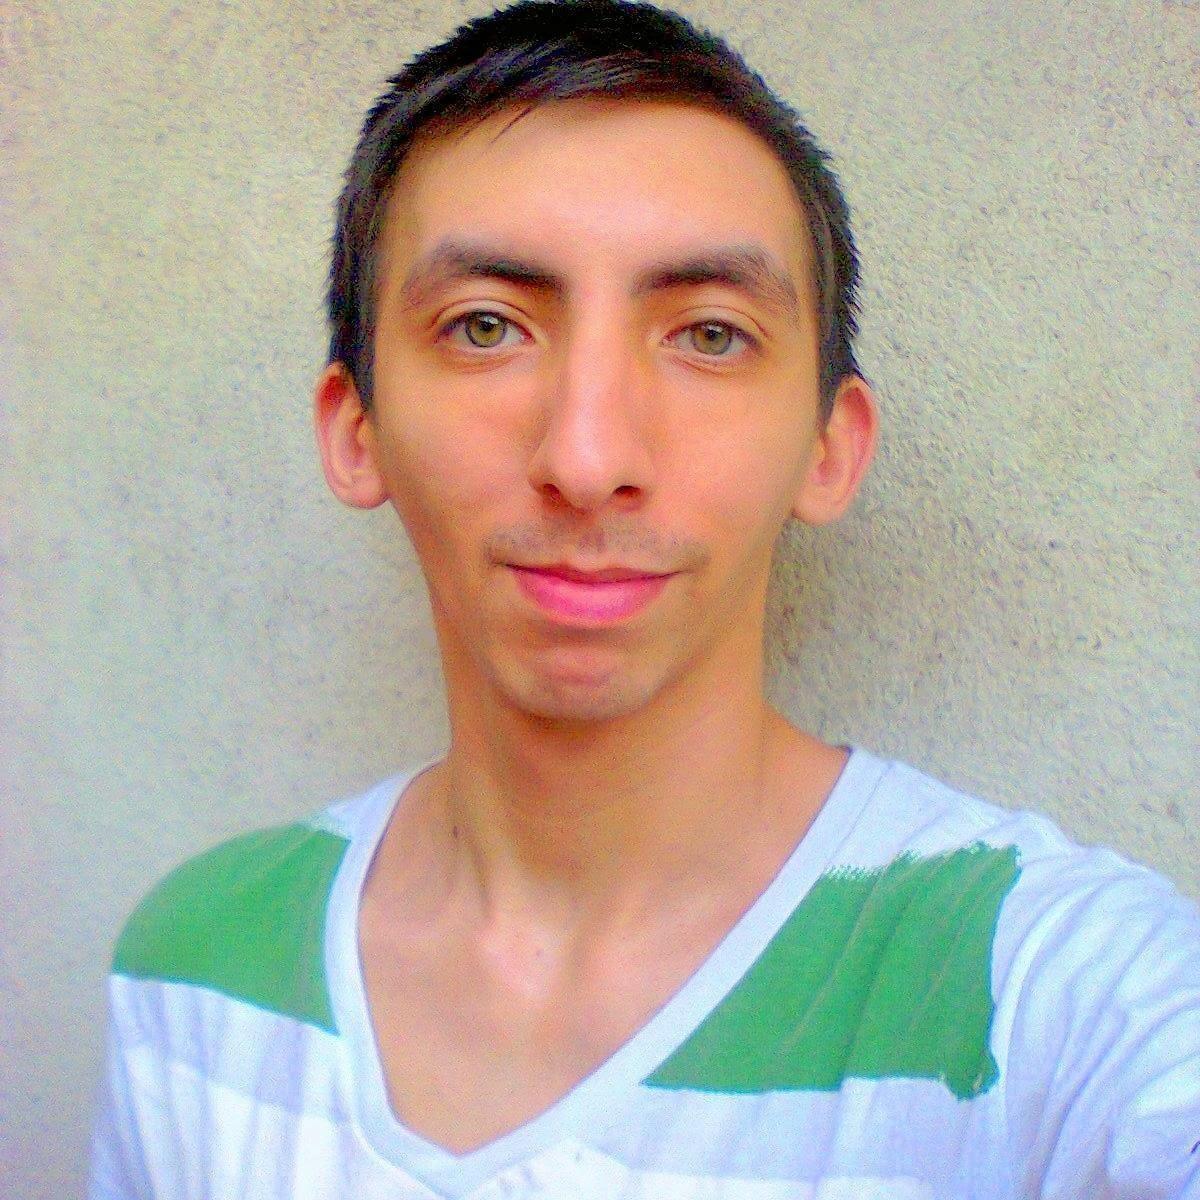 Rodrigo Olabiaga